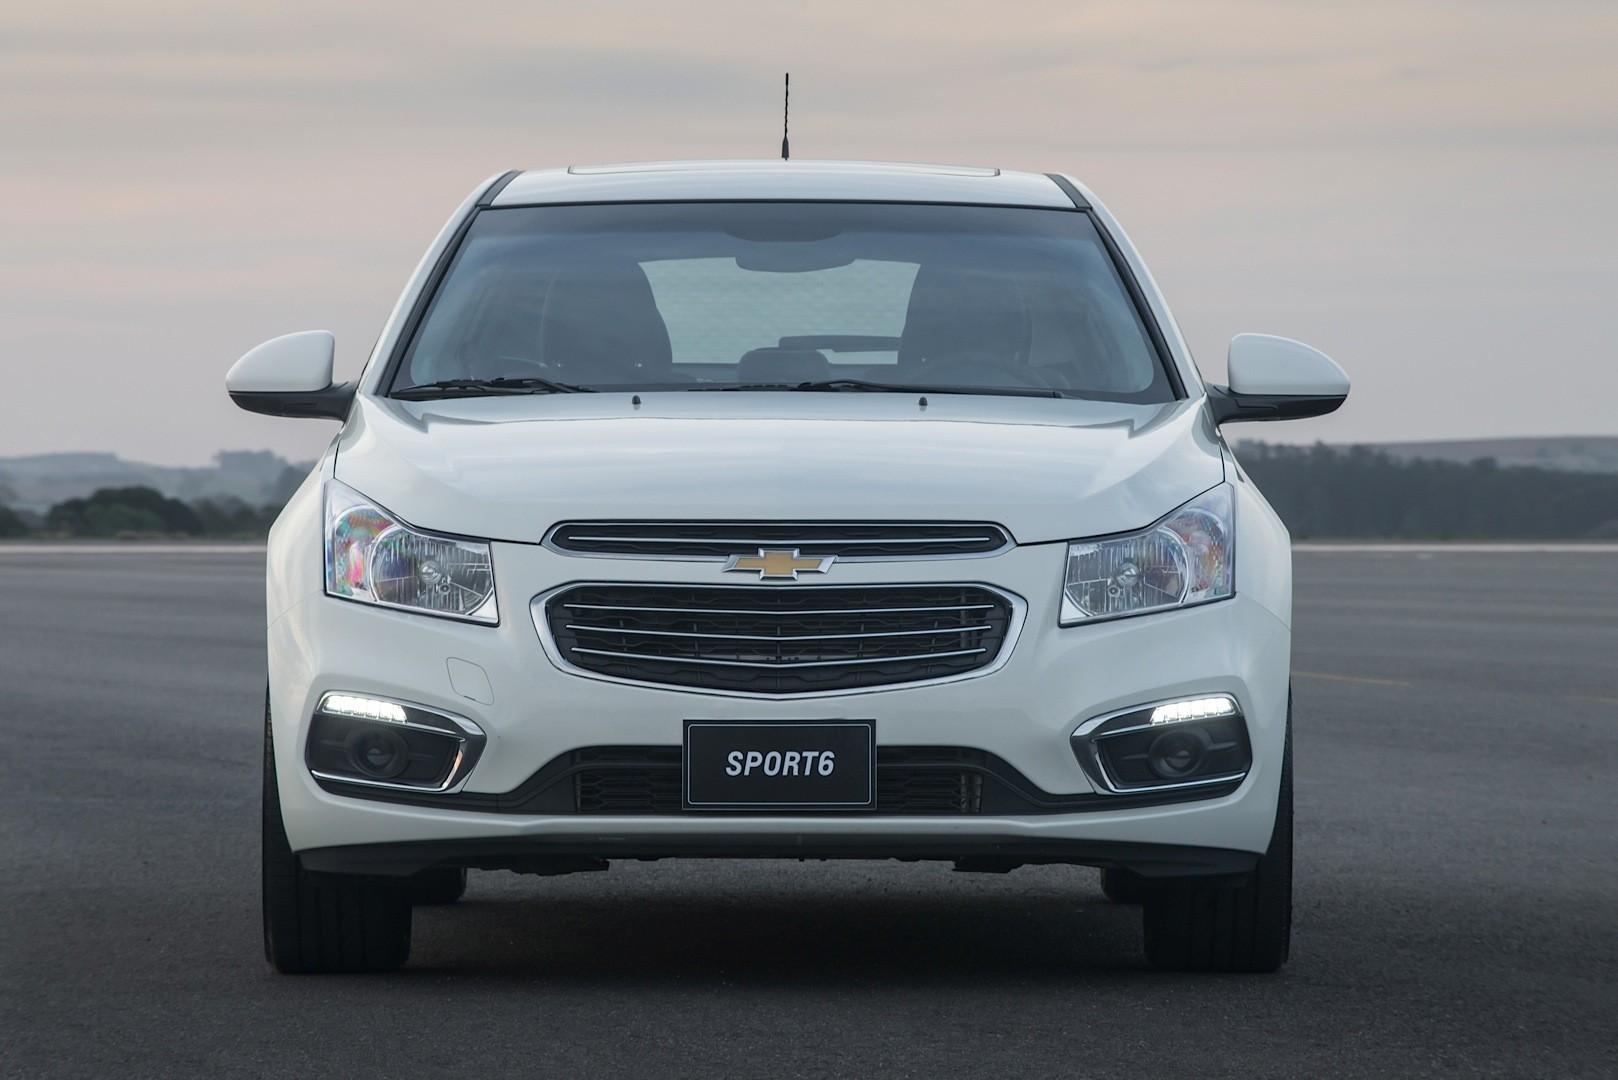 2015 chevrolet cruze sport6 hatch launched in brazil - autoevolution